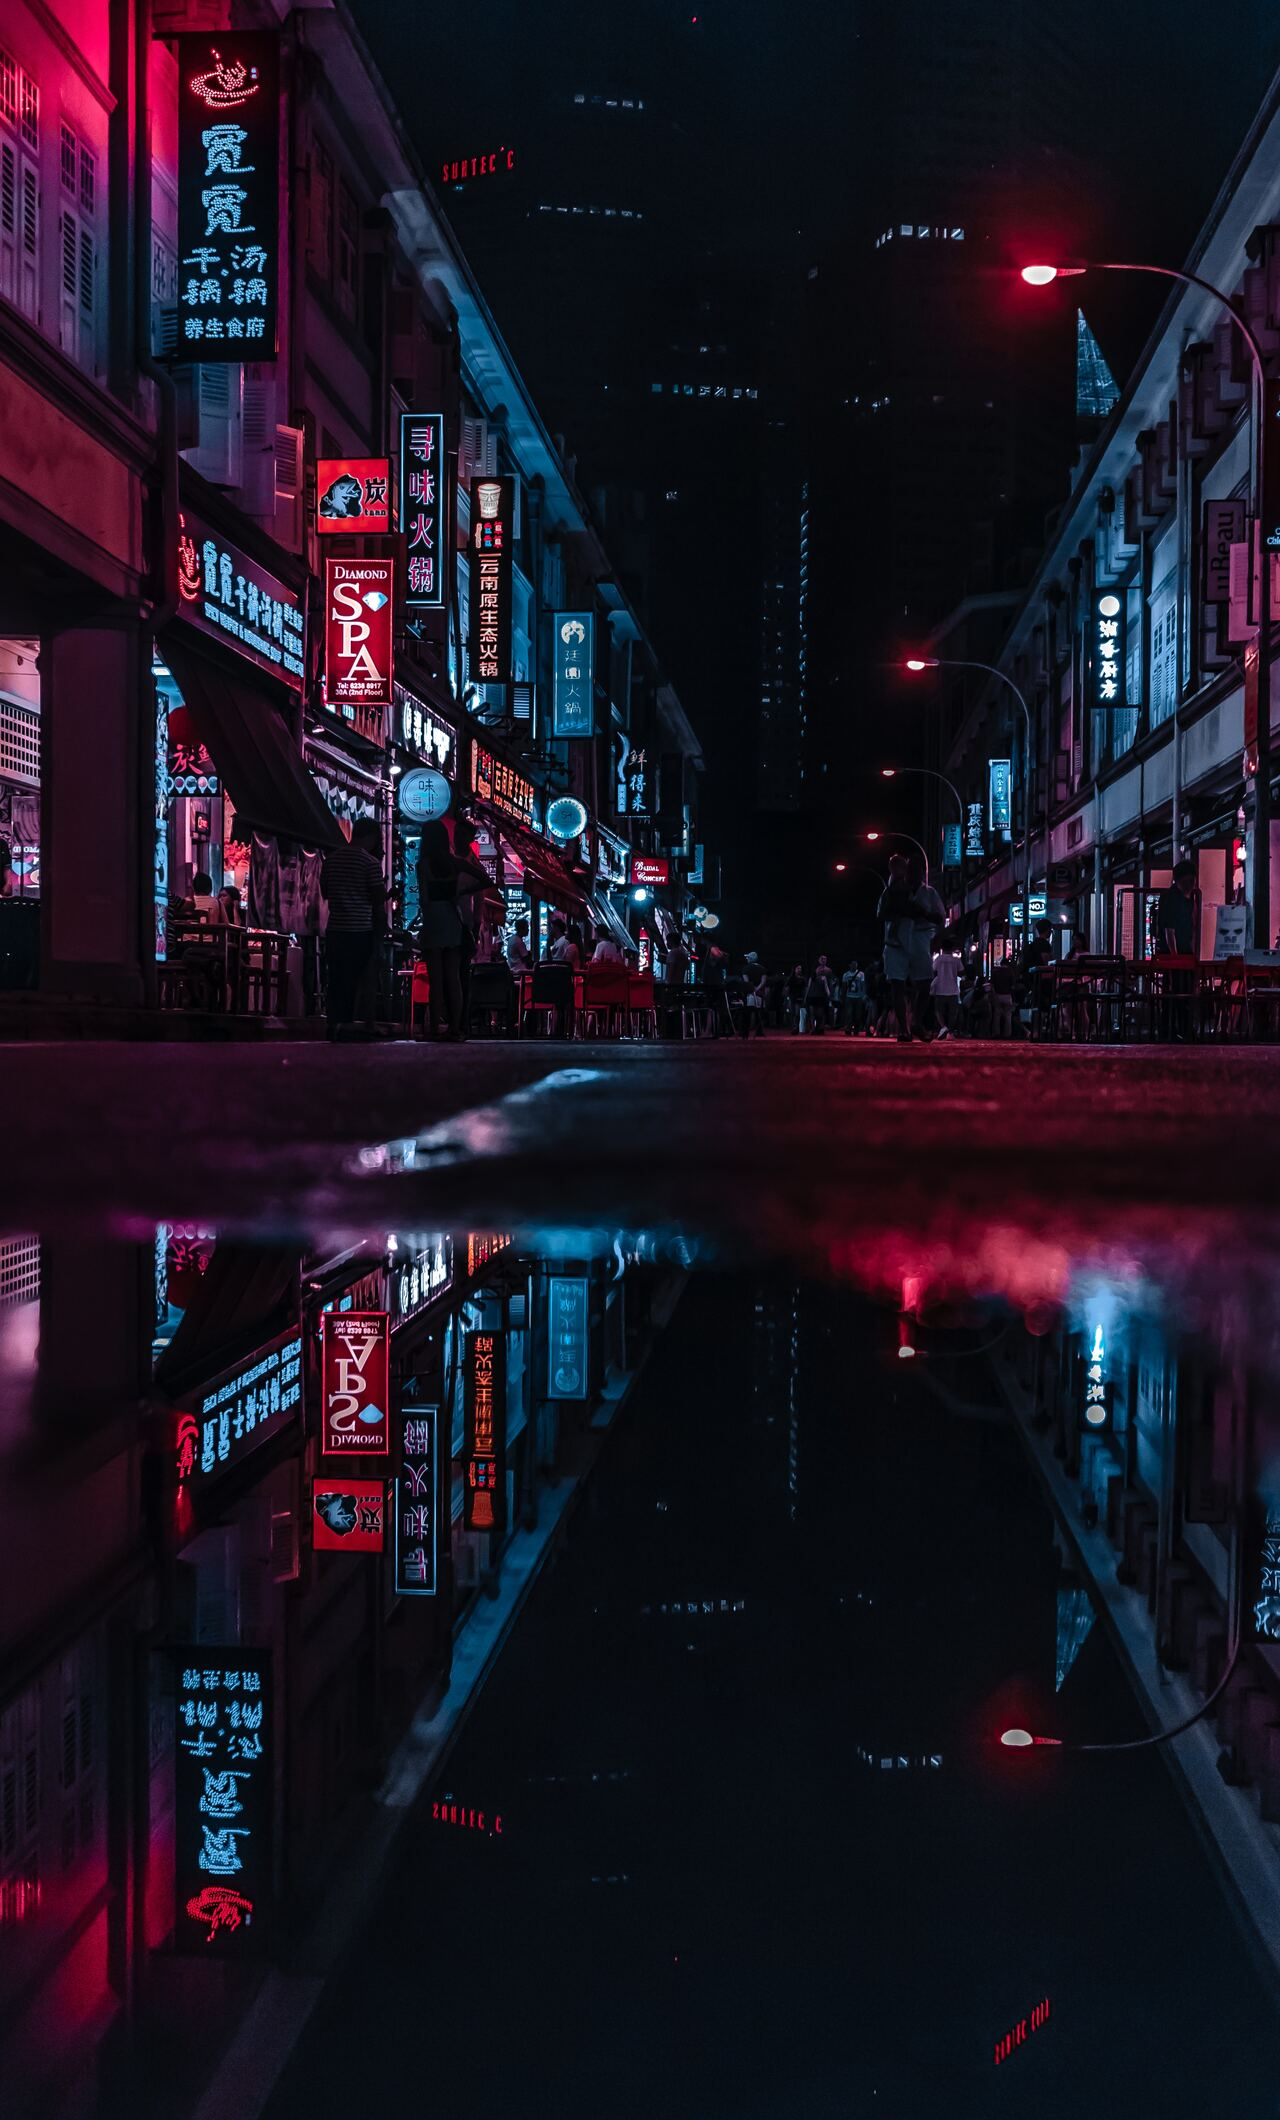 Neon Wallpaper City